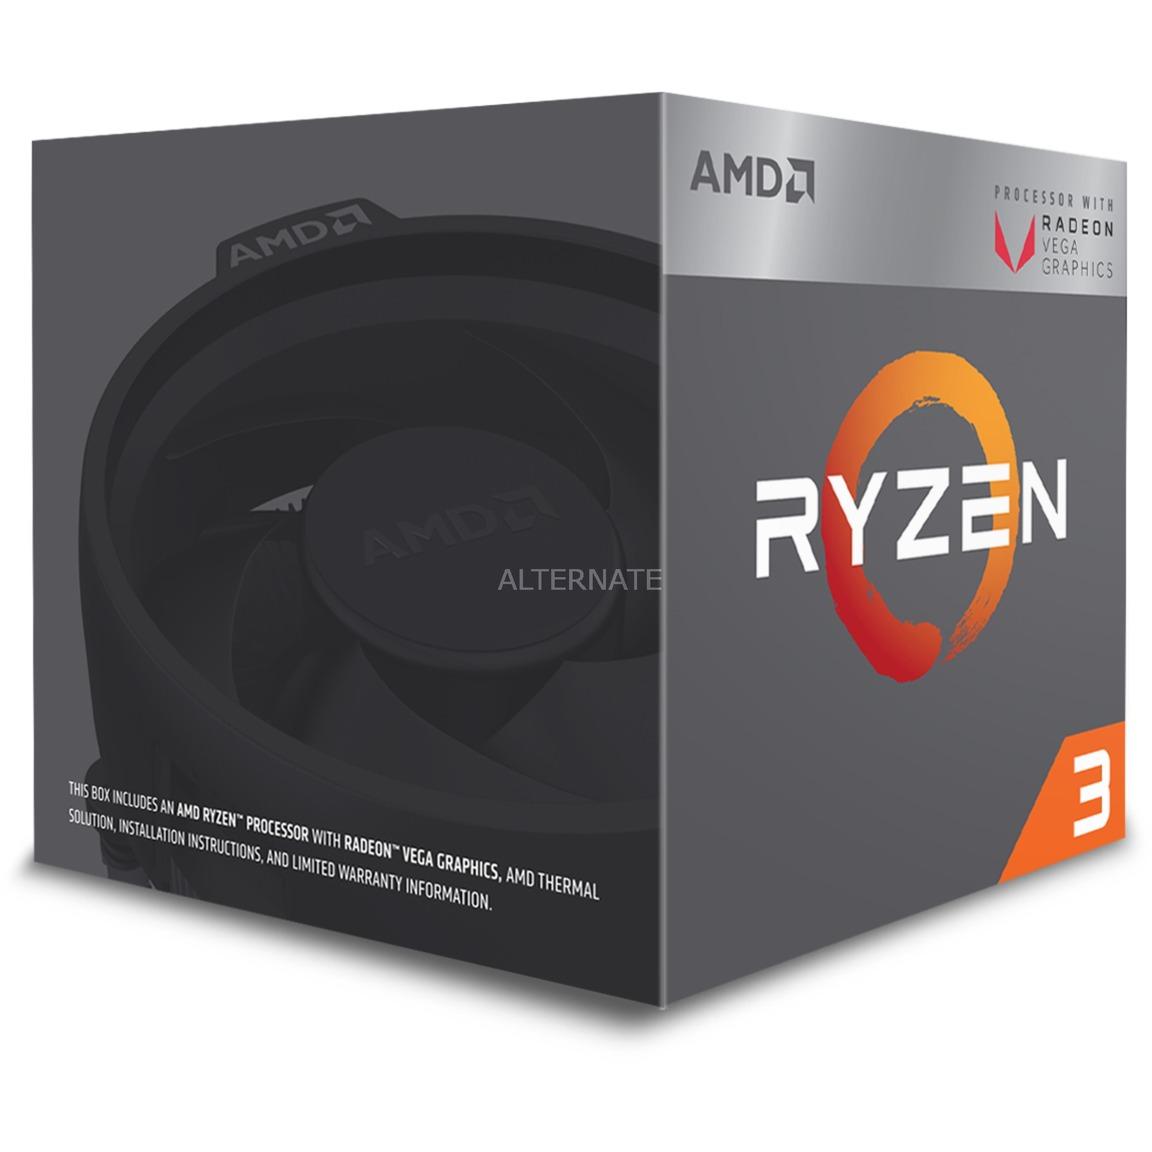 Ryzen 3 2200G 3.5GHz 2MB L2 Caja procesador